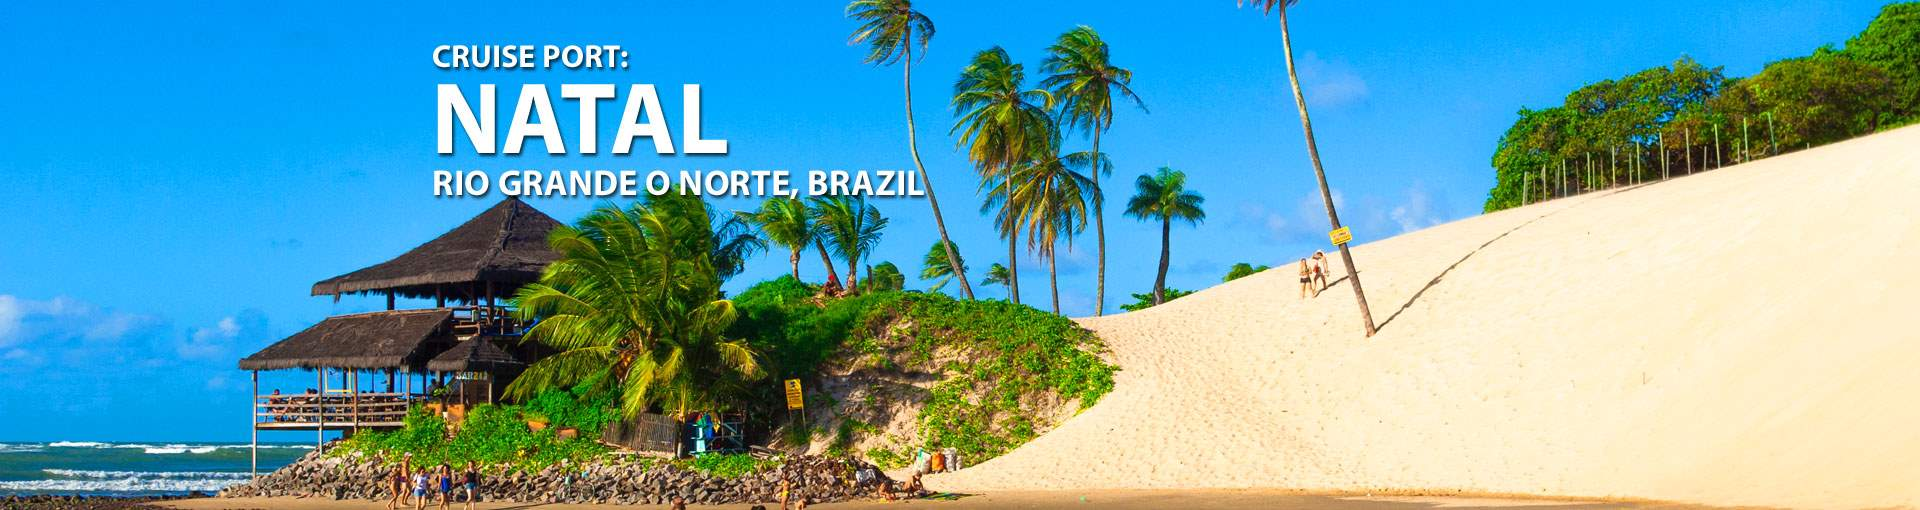 Cruises to Natal(Rio Grande Do Norte), Brazil